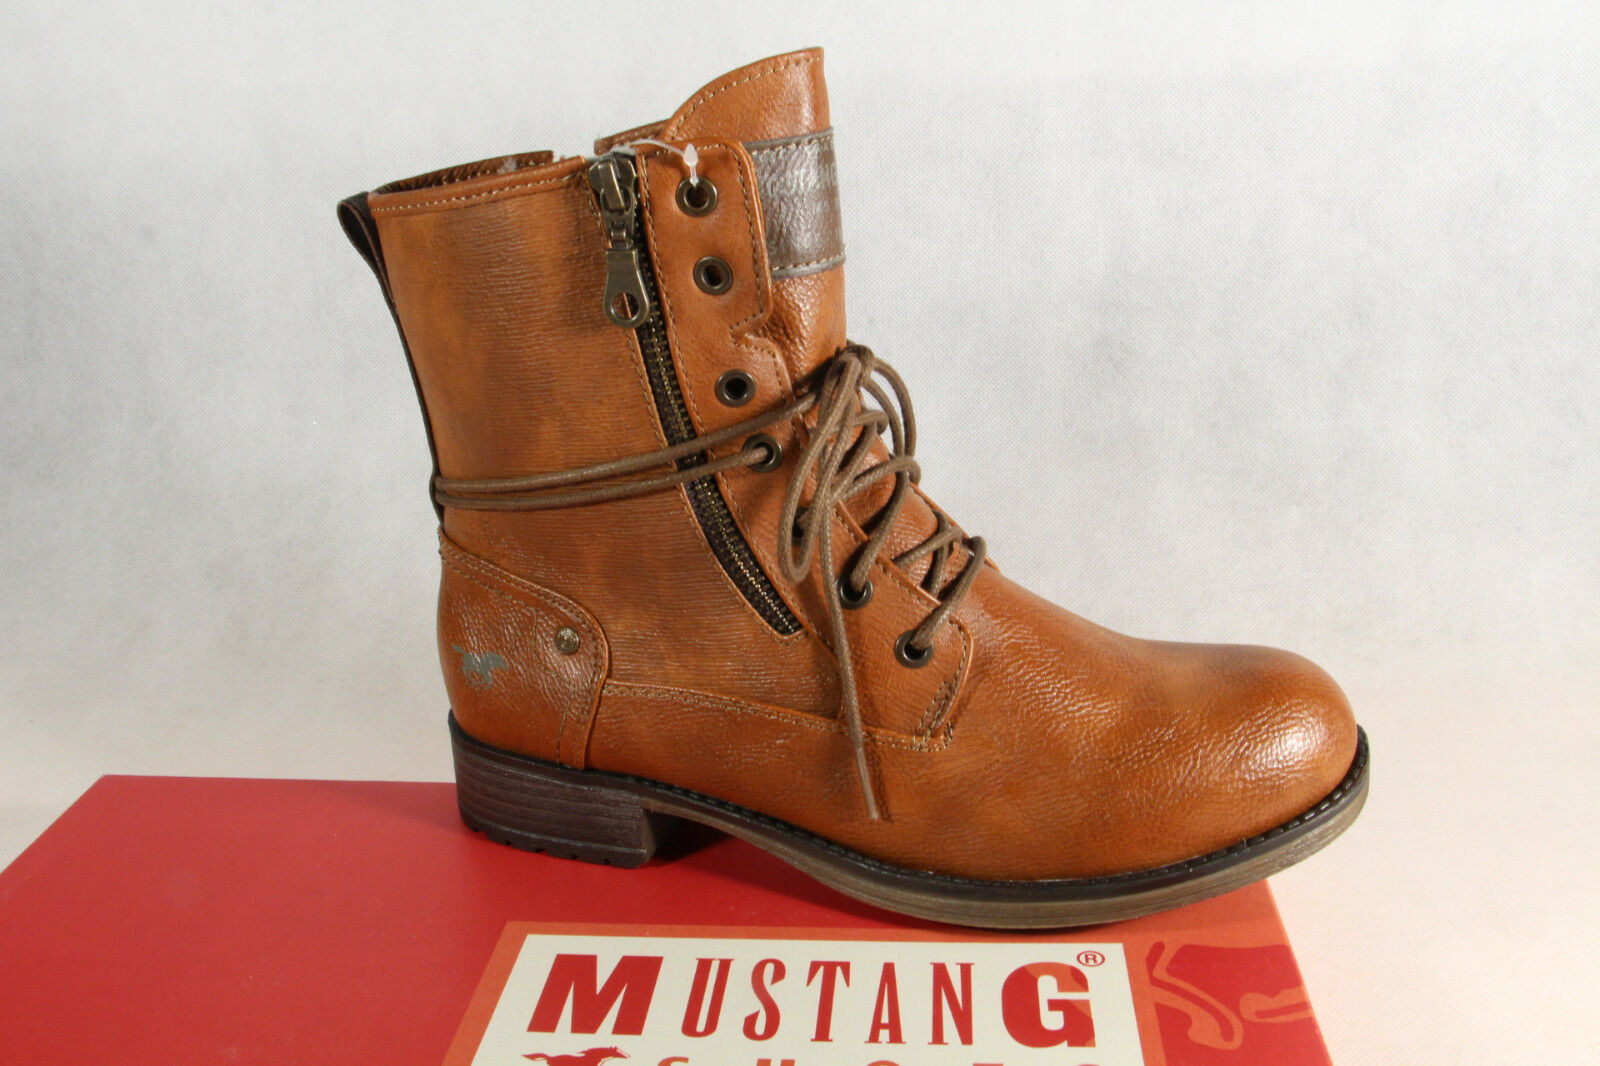 Mustang Mustang Mustang Stiefel Stiefeletten Schnürstiefel Stiefel braun 1139 NEU  6c775a